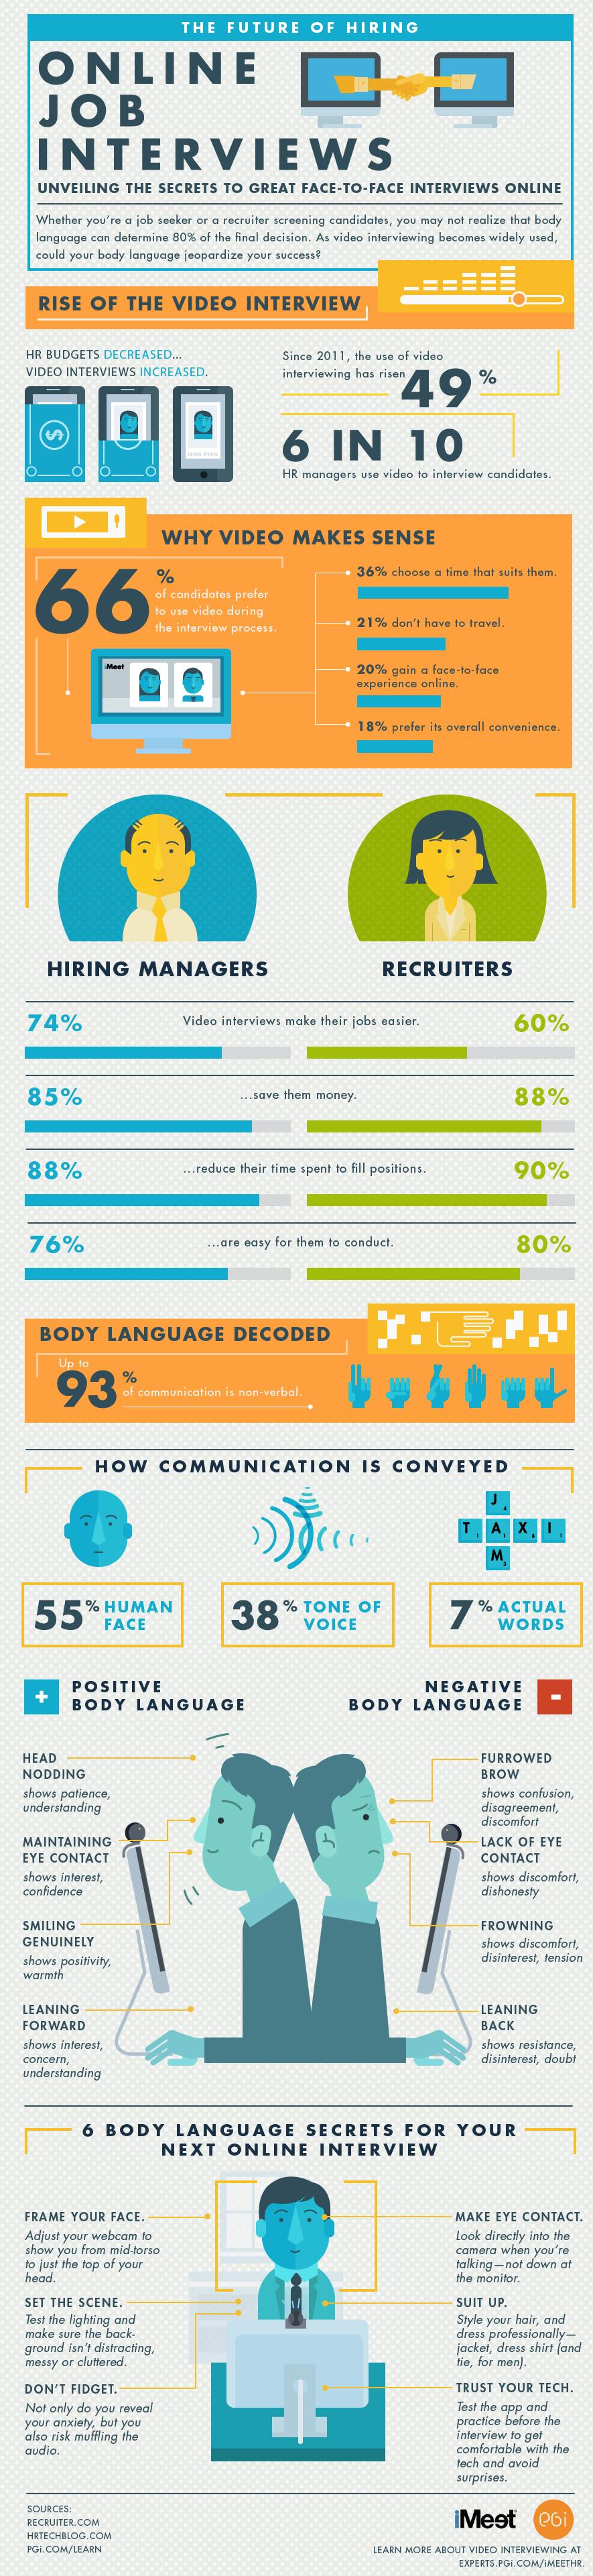 PGI-online-job-interview-infographic (1)